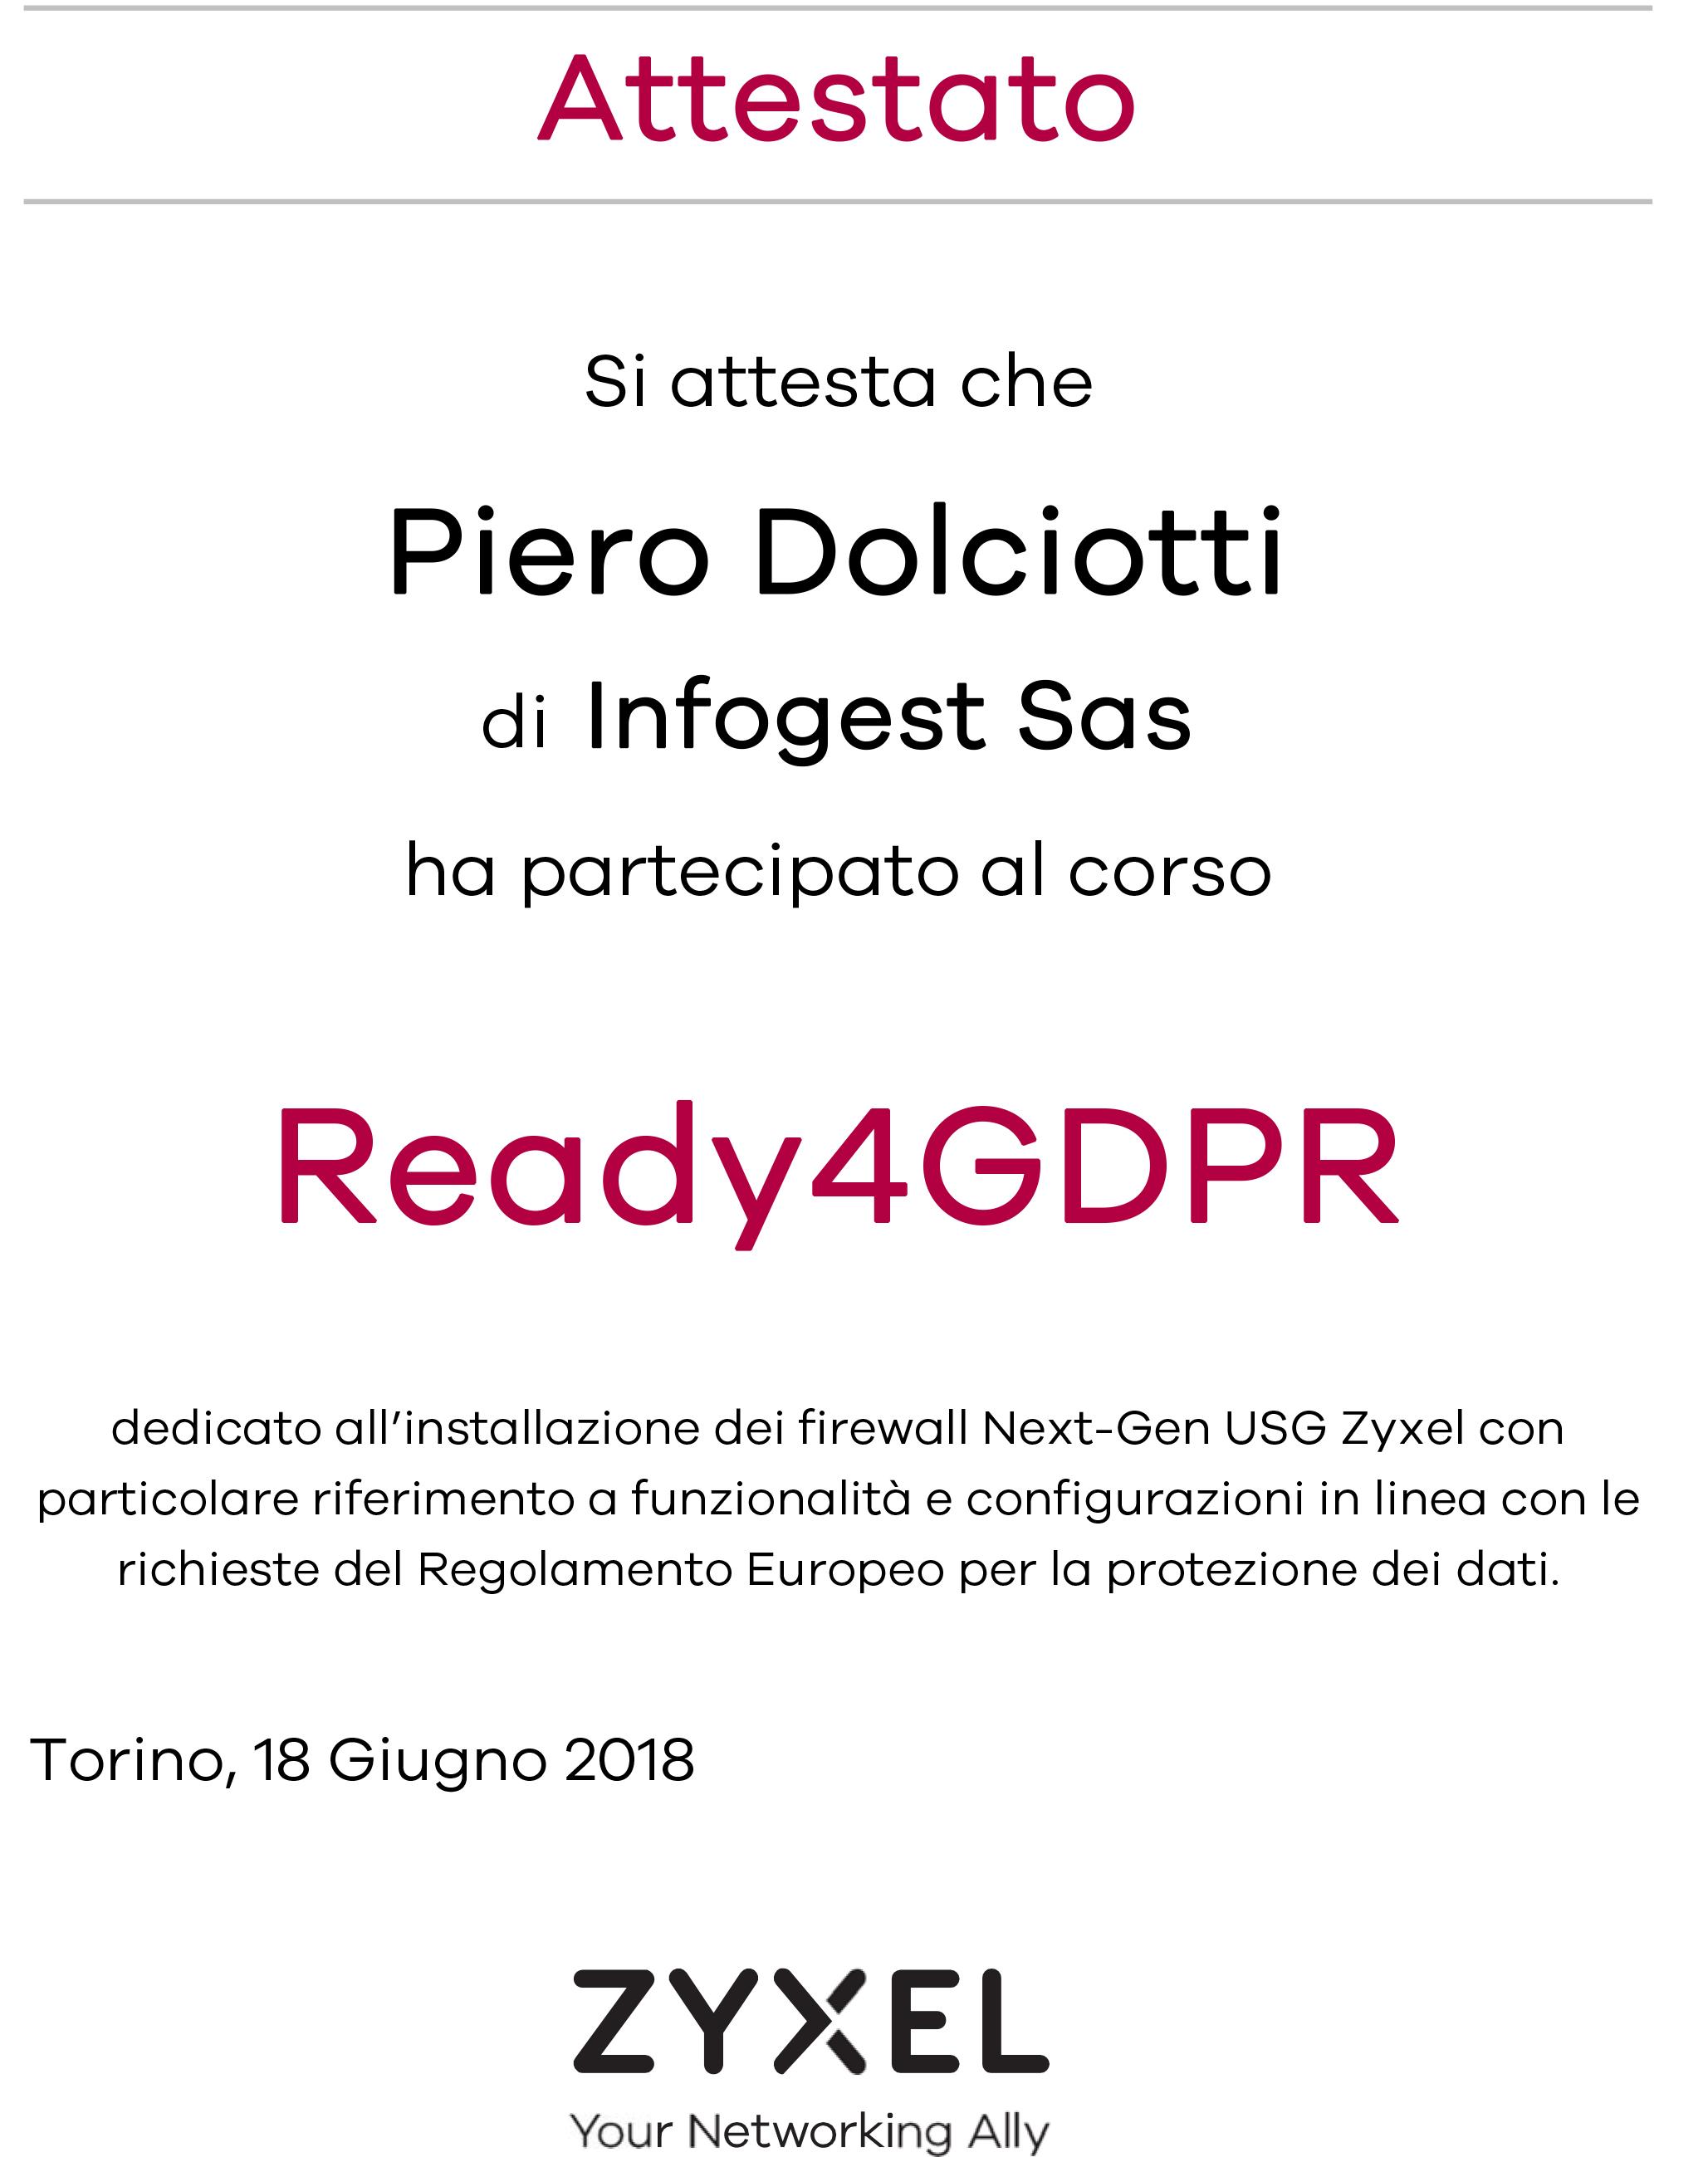 https://infogest.eu/wp-content/uploads/2018/08/Zyxel_Ready4GDPR_Attestato.jpg